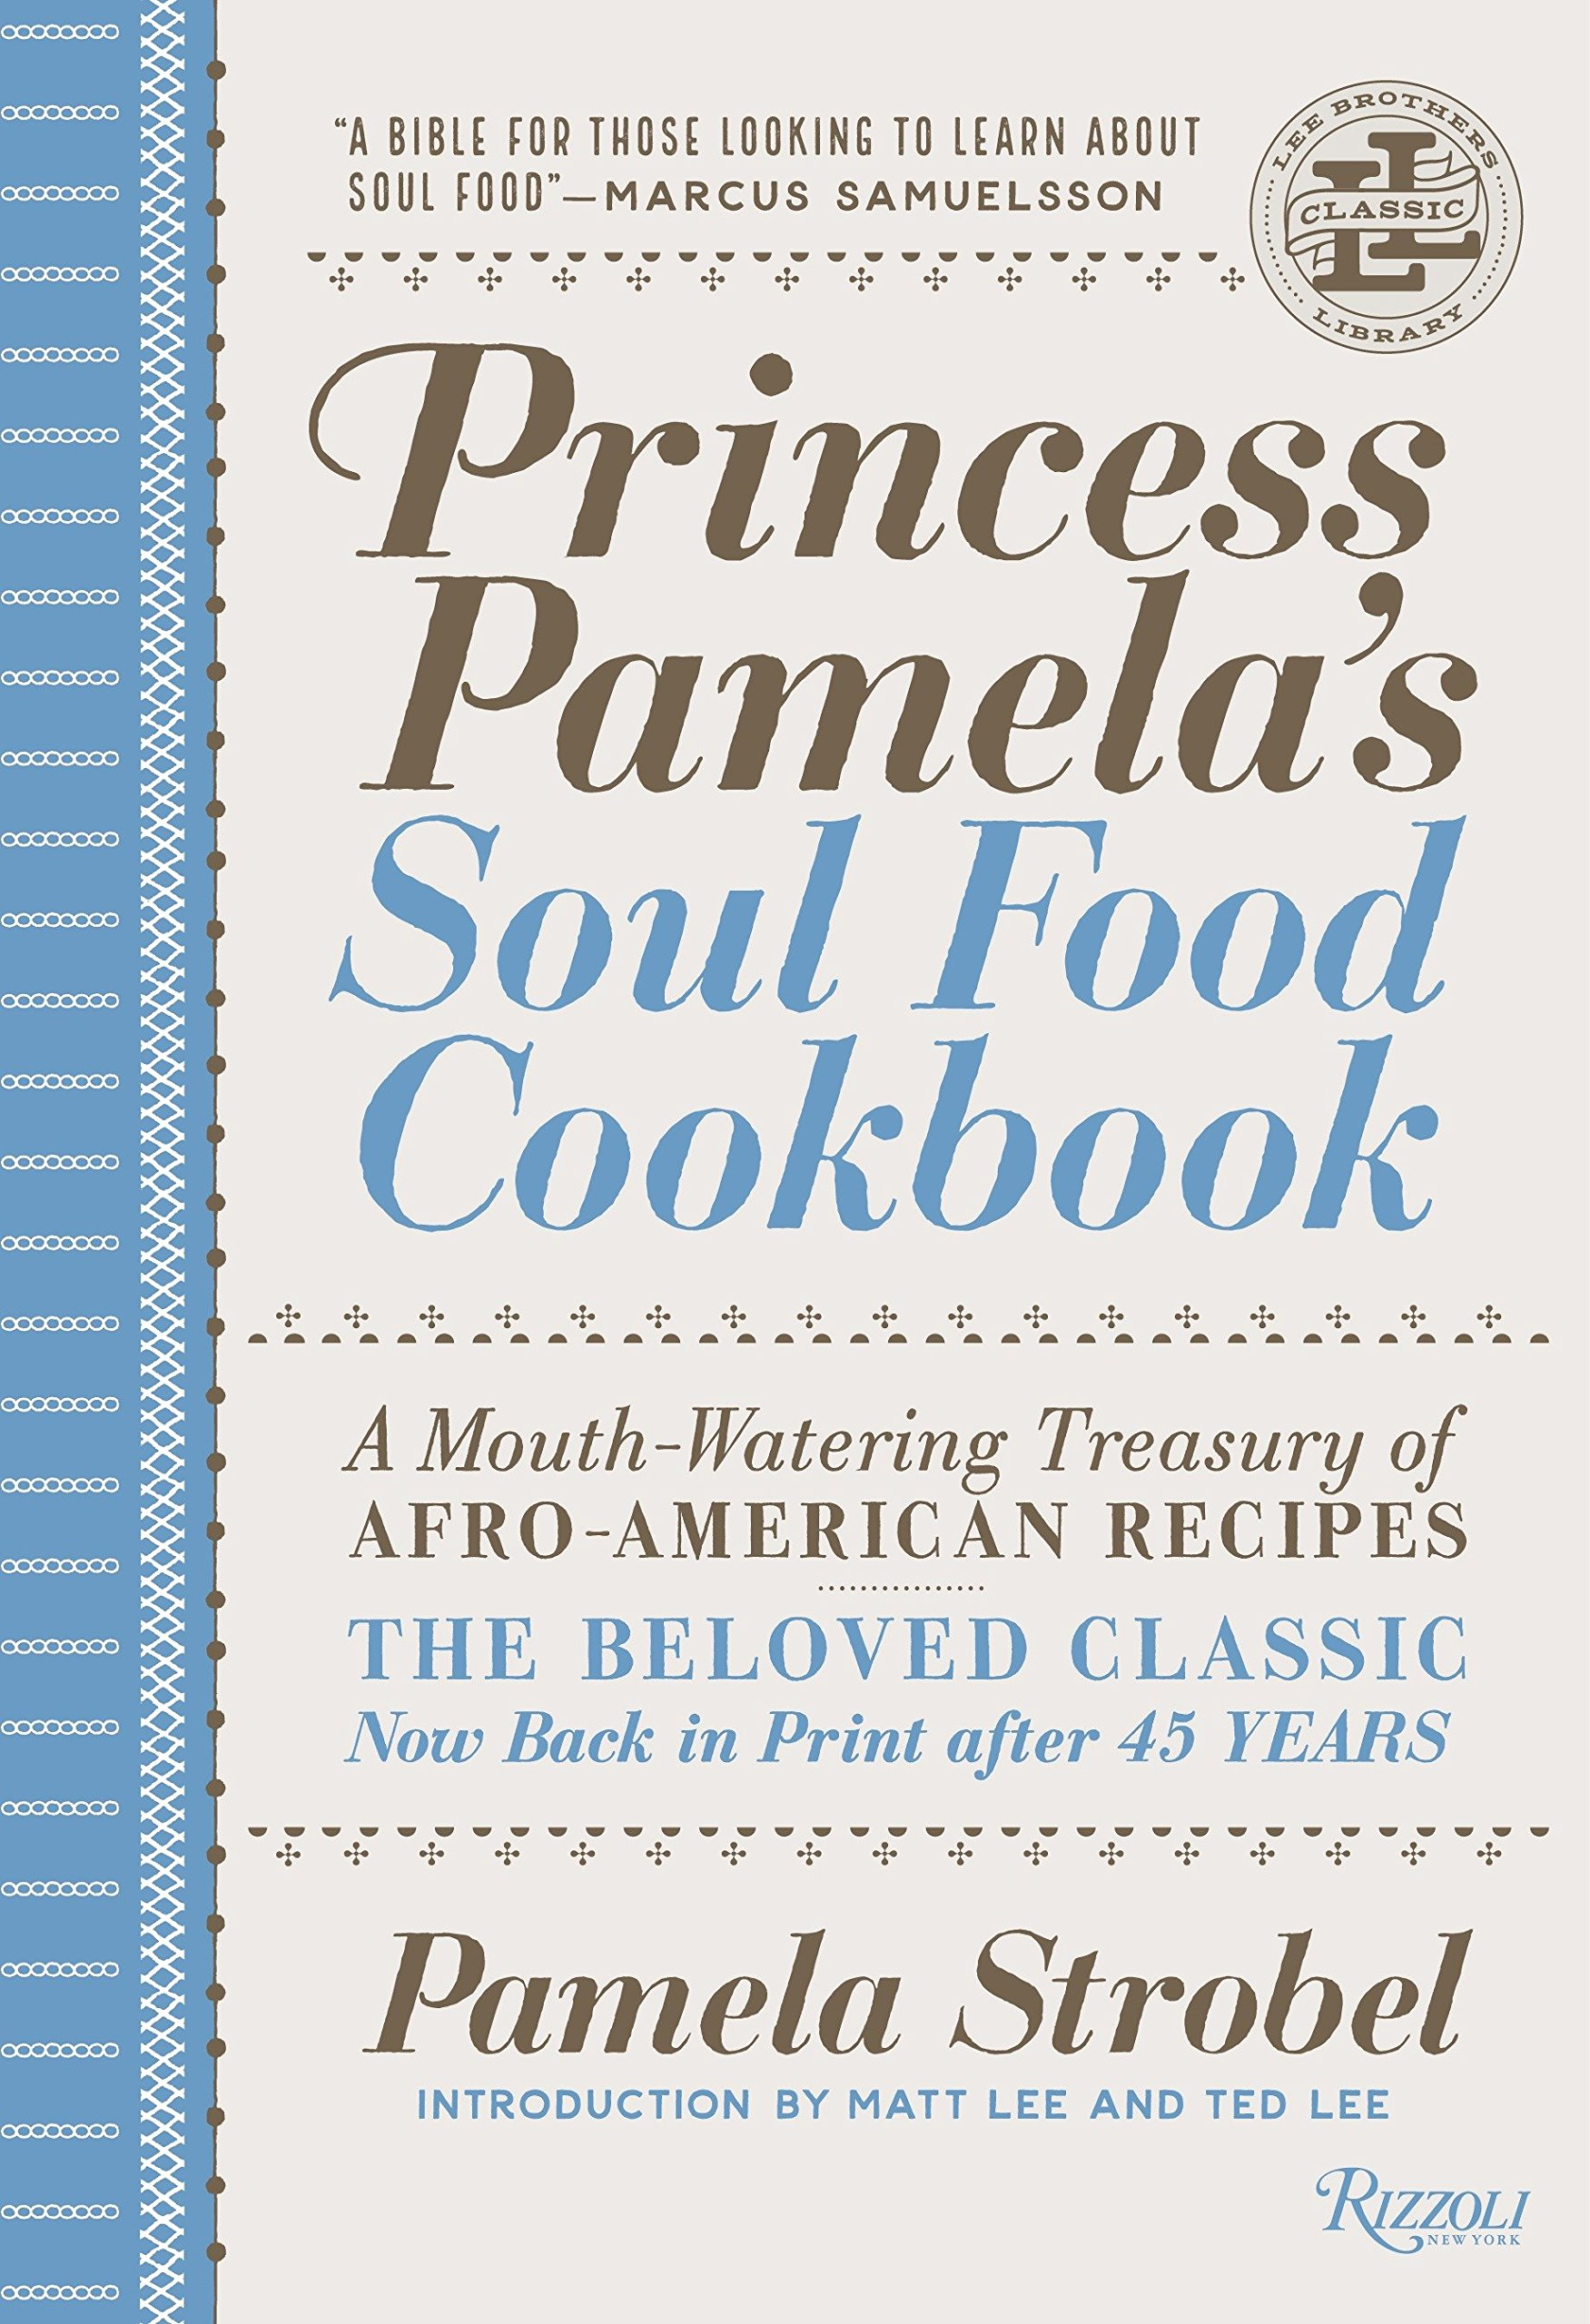 Princess Pamela's Soul Food Cookbook: A Mouth-Watering Treasury of Afro-American Recipes ebook